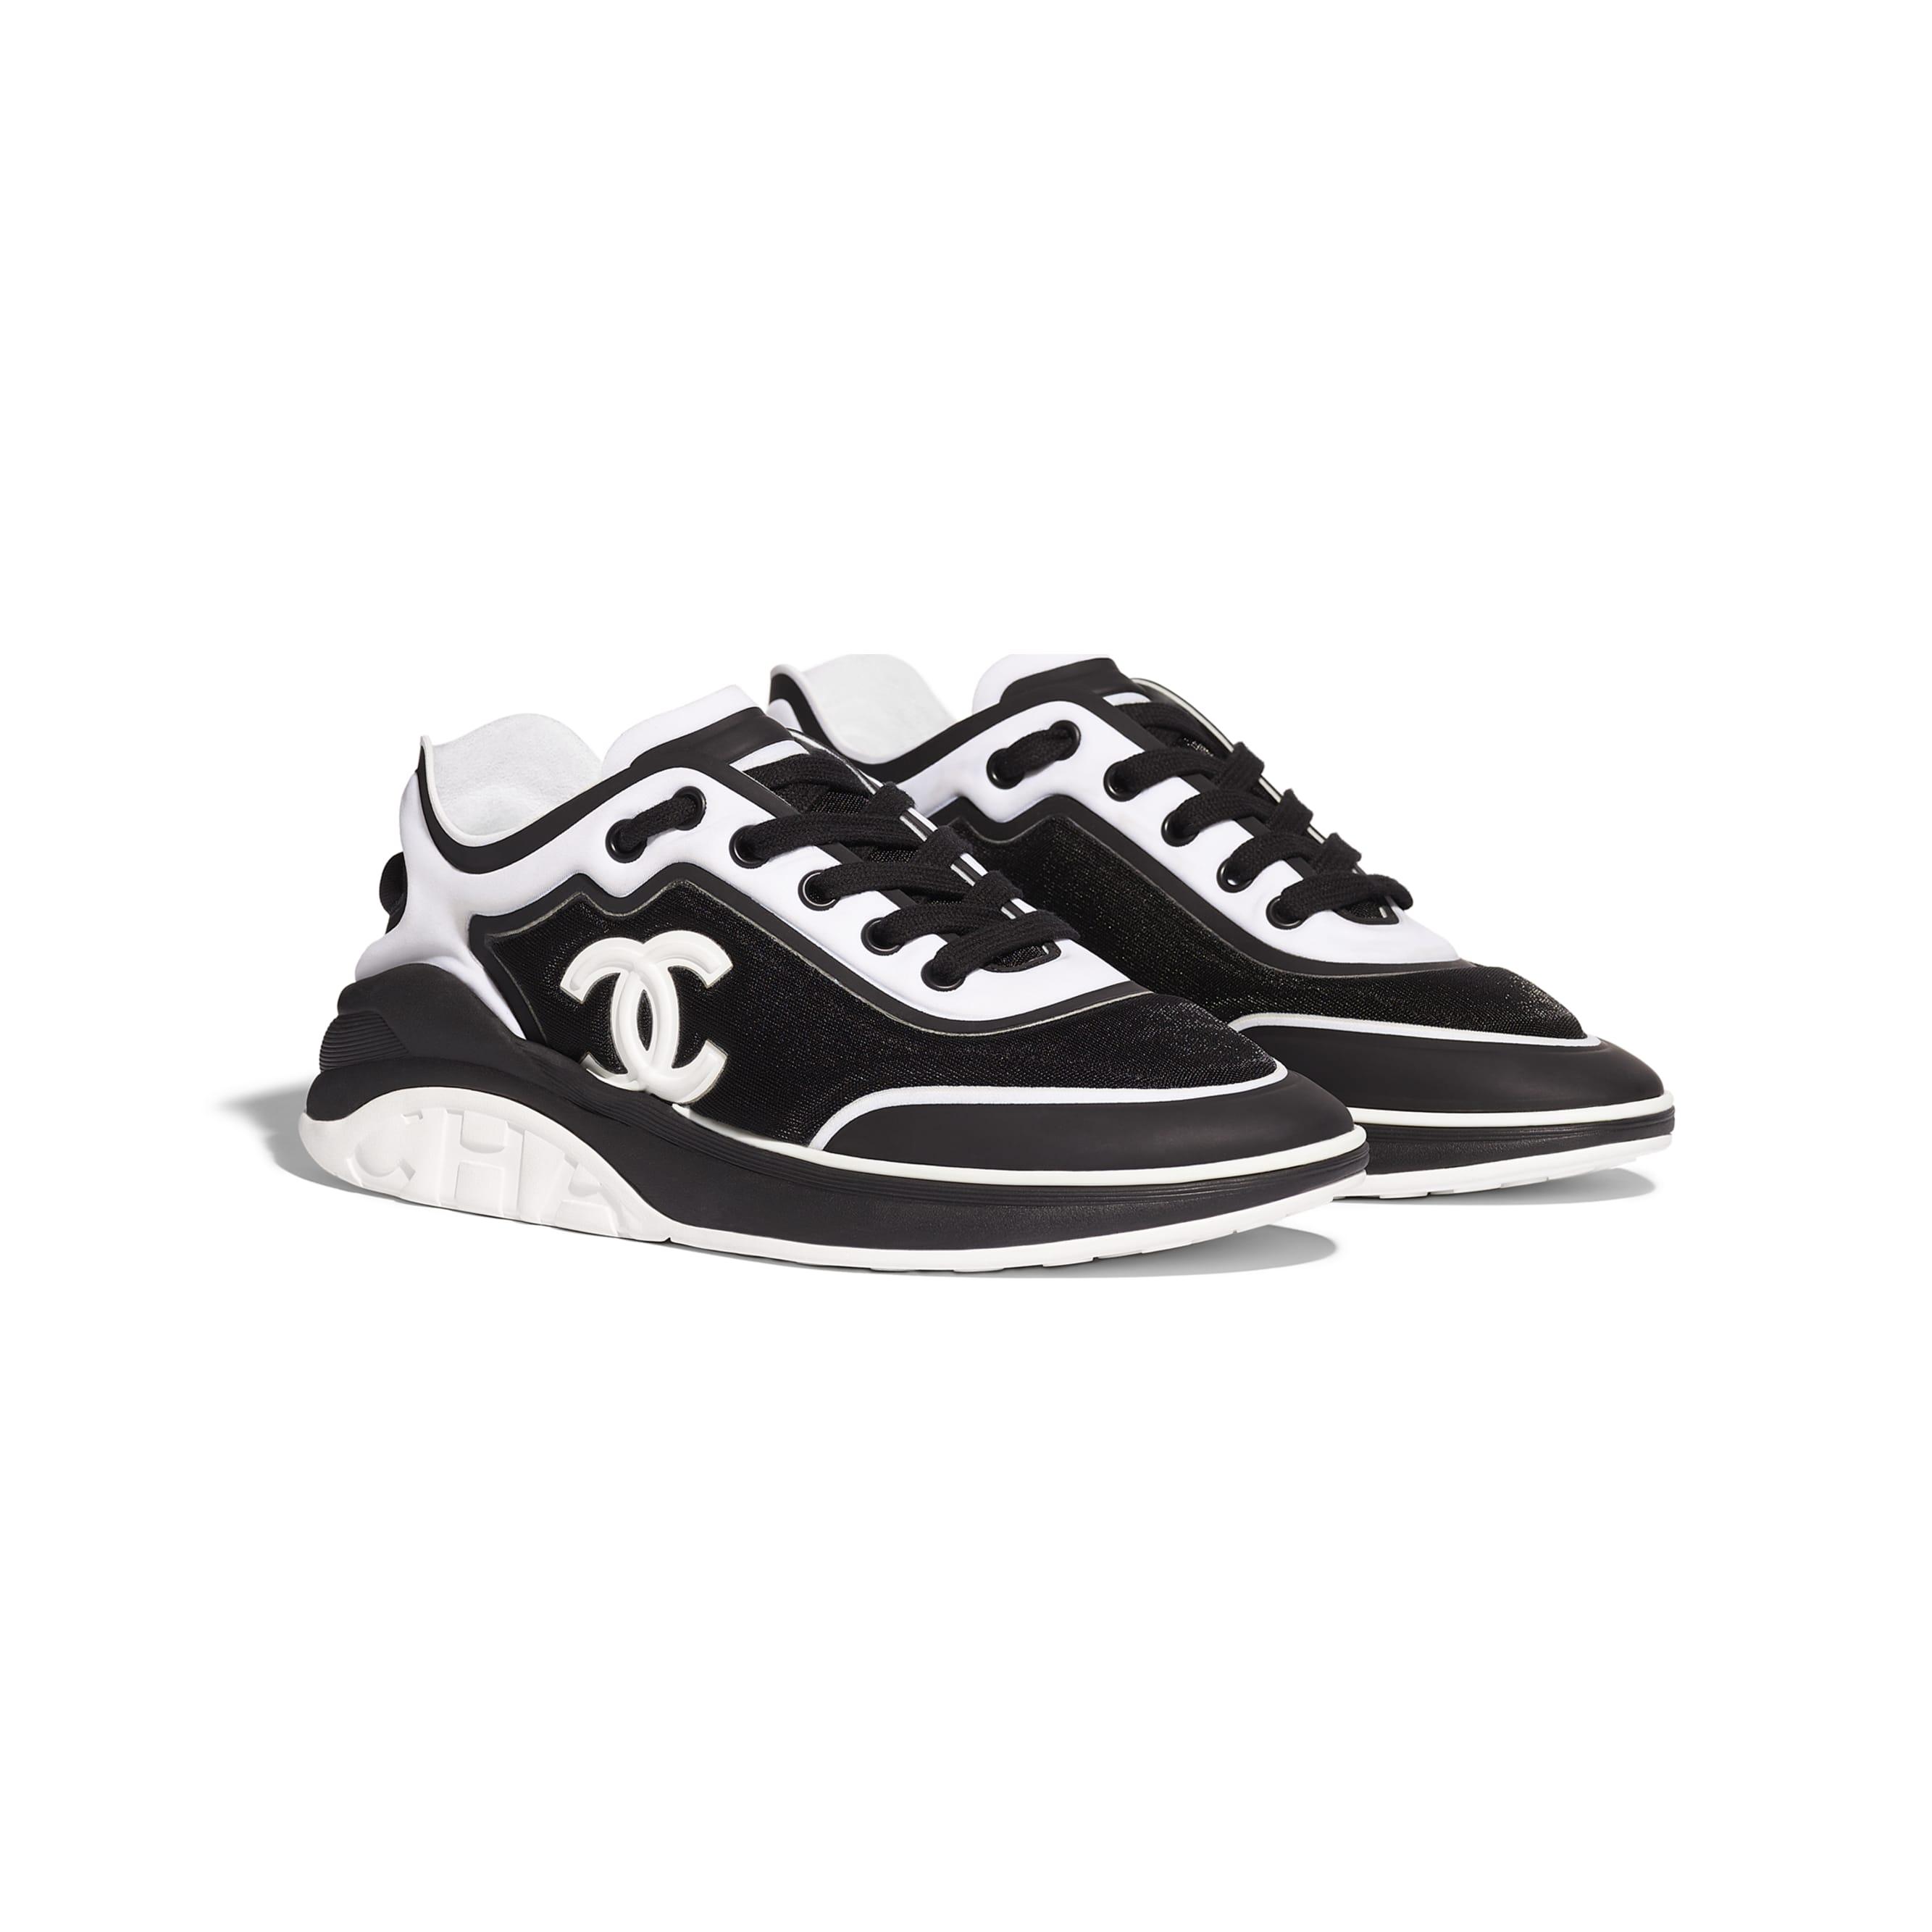 Sneakers - Black & White - Mesh & Lycra - Alternative view - see standard sized version